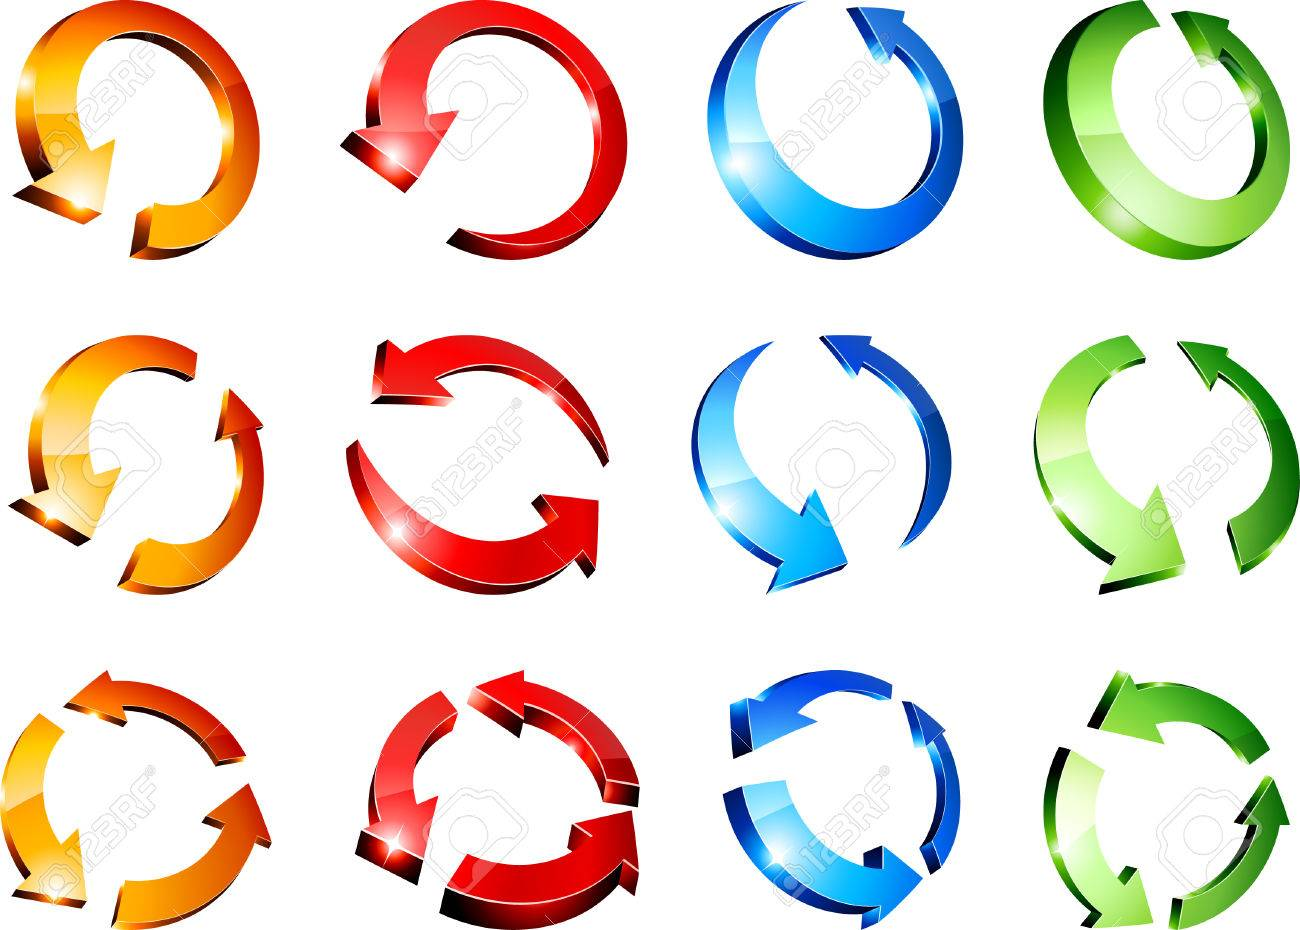 Set of arrows. Vector illustration. Stock Vector - 6416730